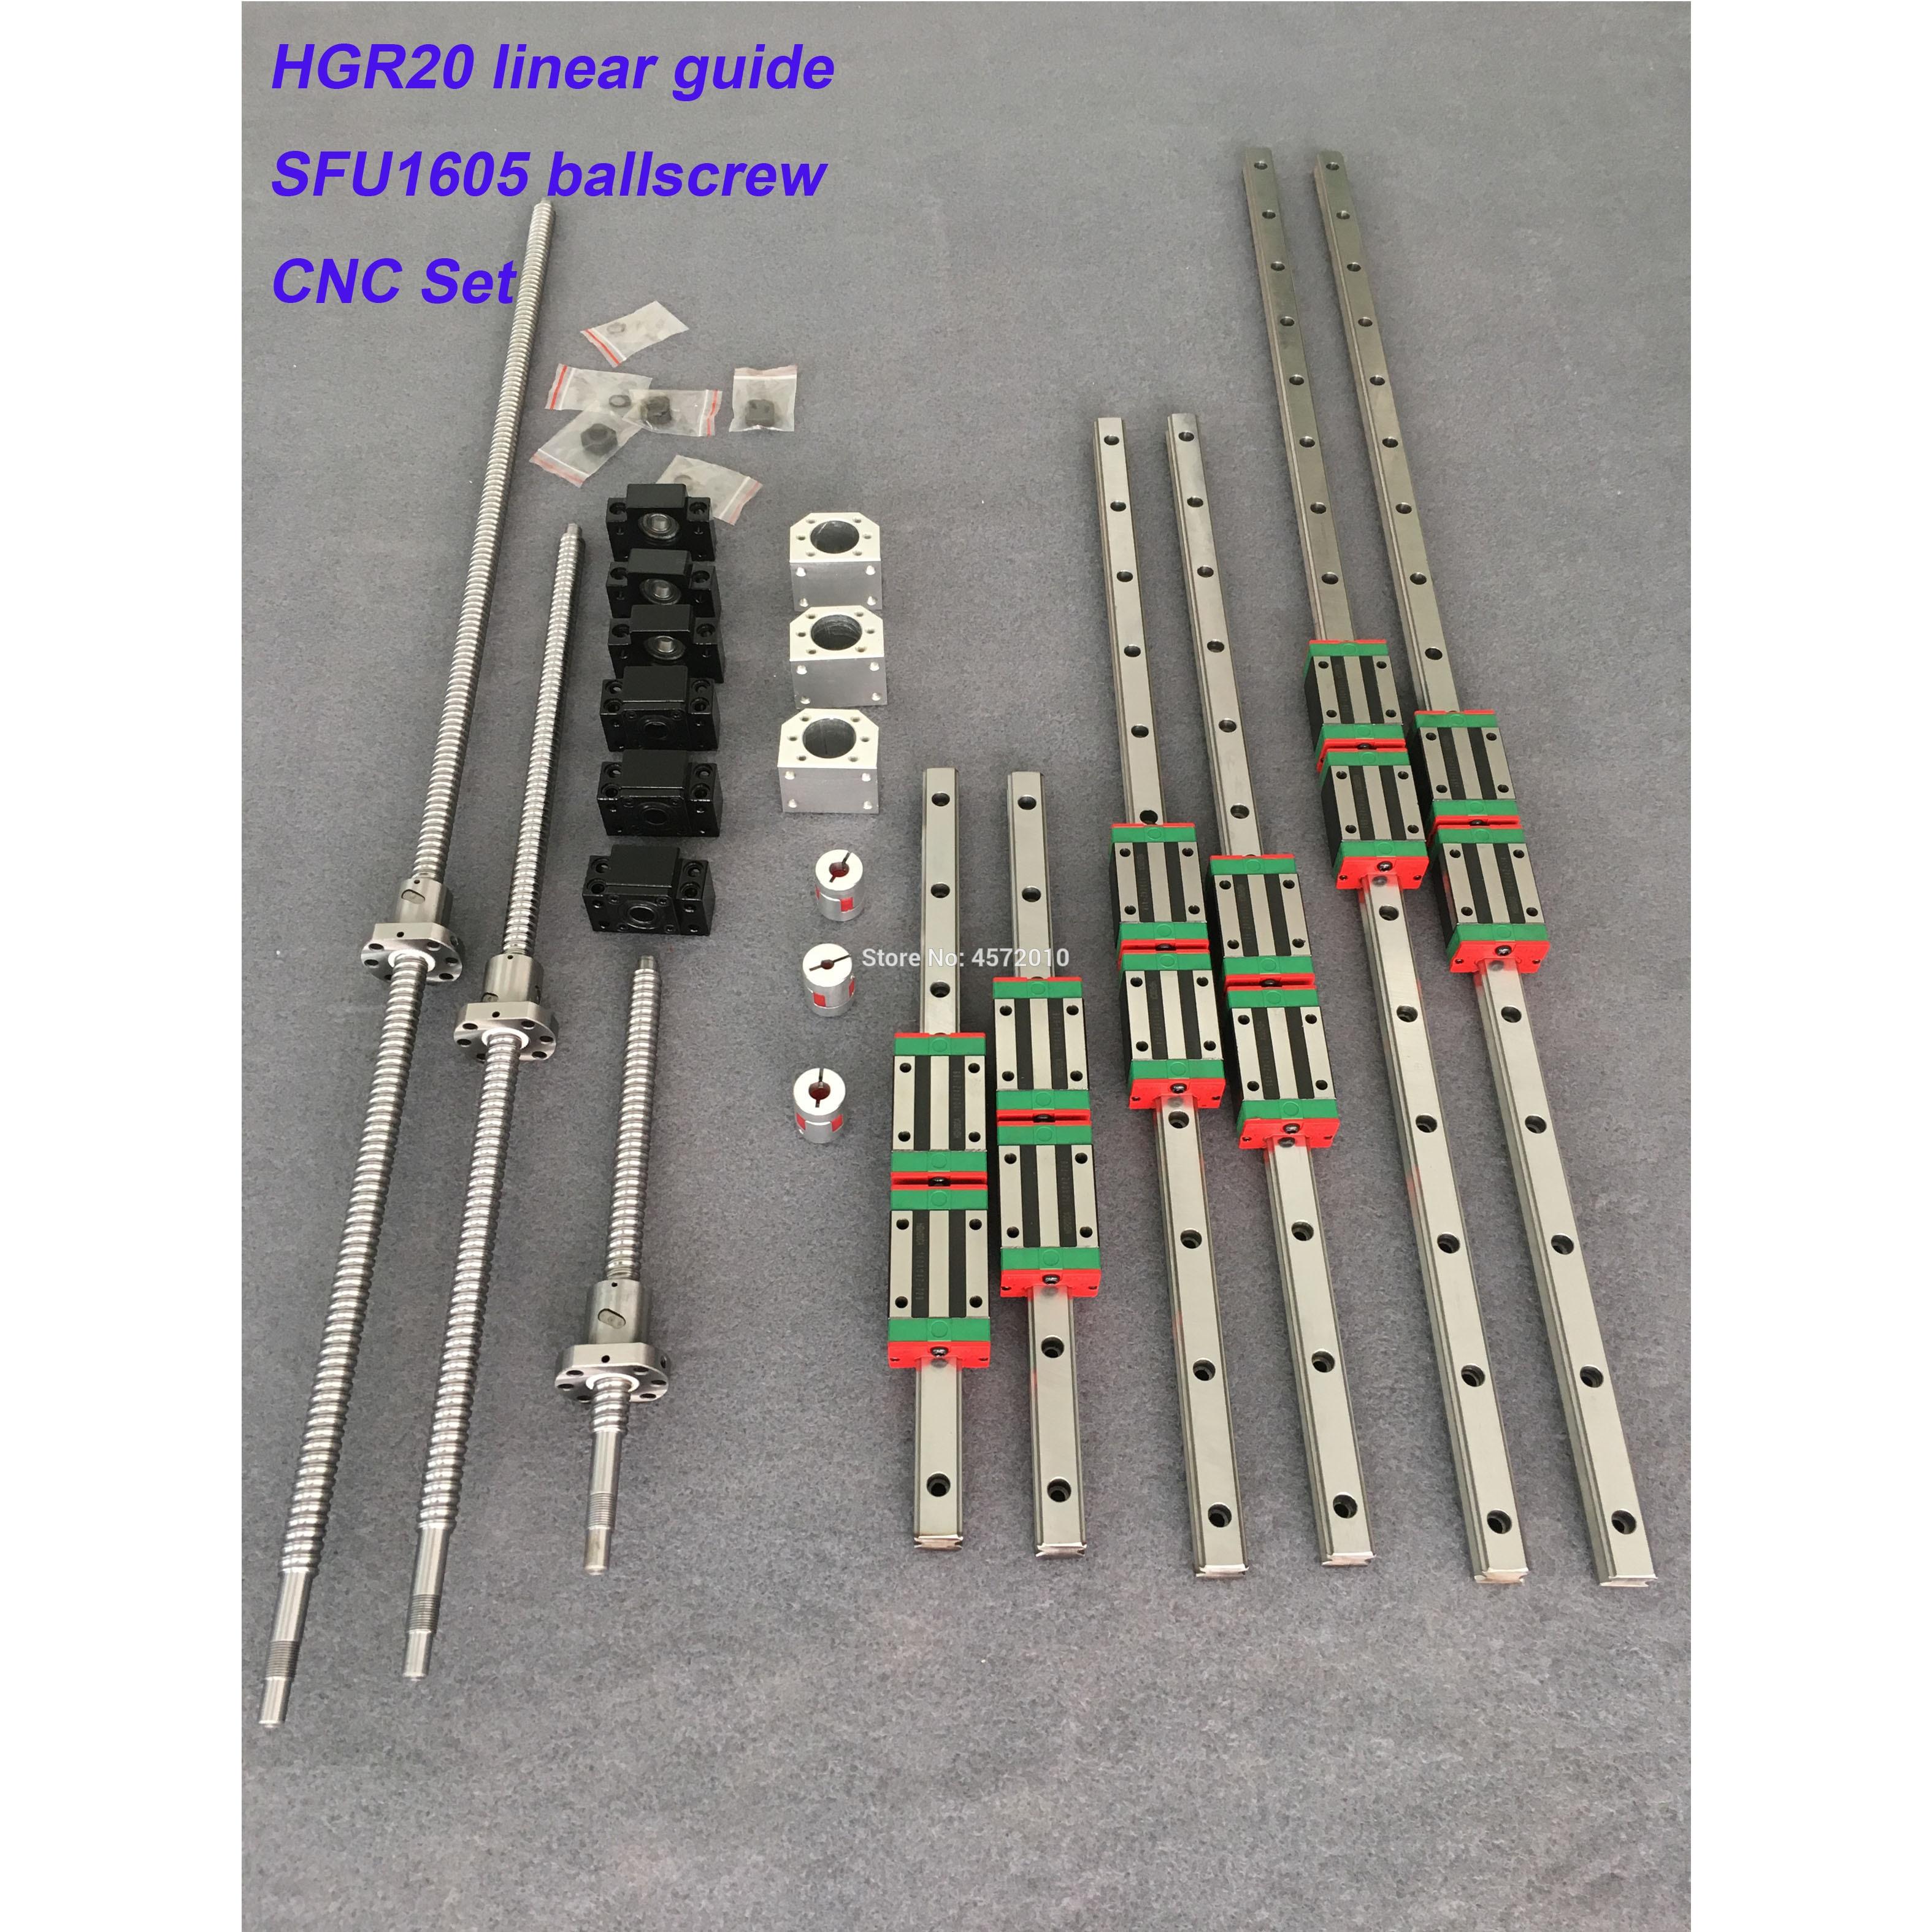 HGR20 set Square Linear guide + SFU1605 / 1610  ballscrew + BK BF12 + Nut housing + Coupling for Spindle motor kit